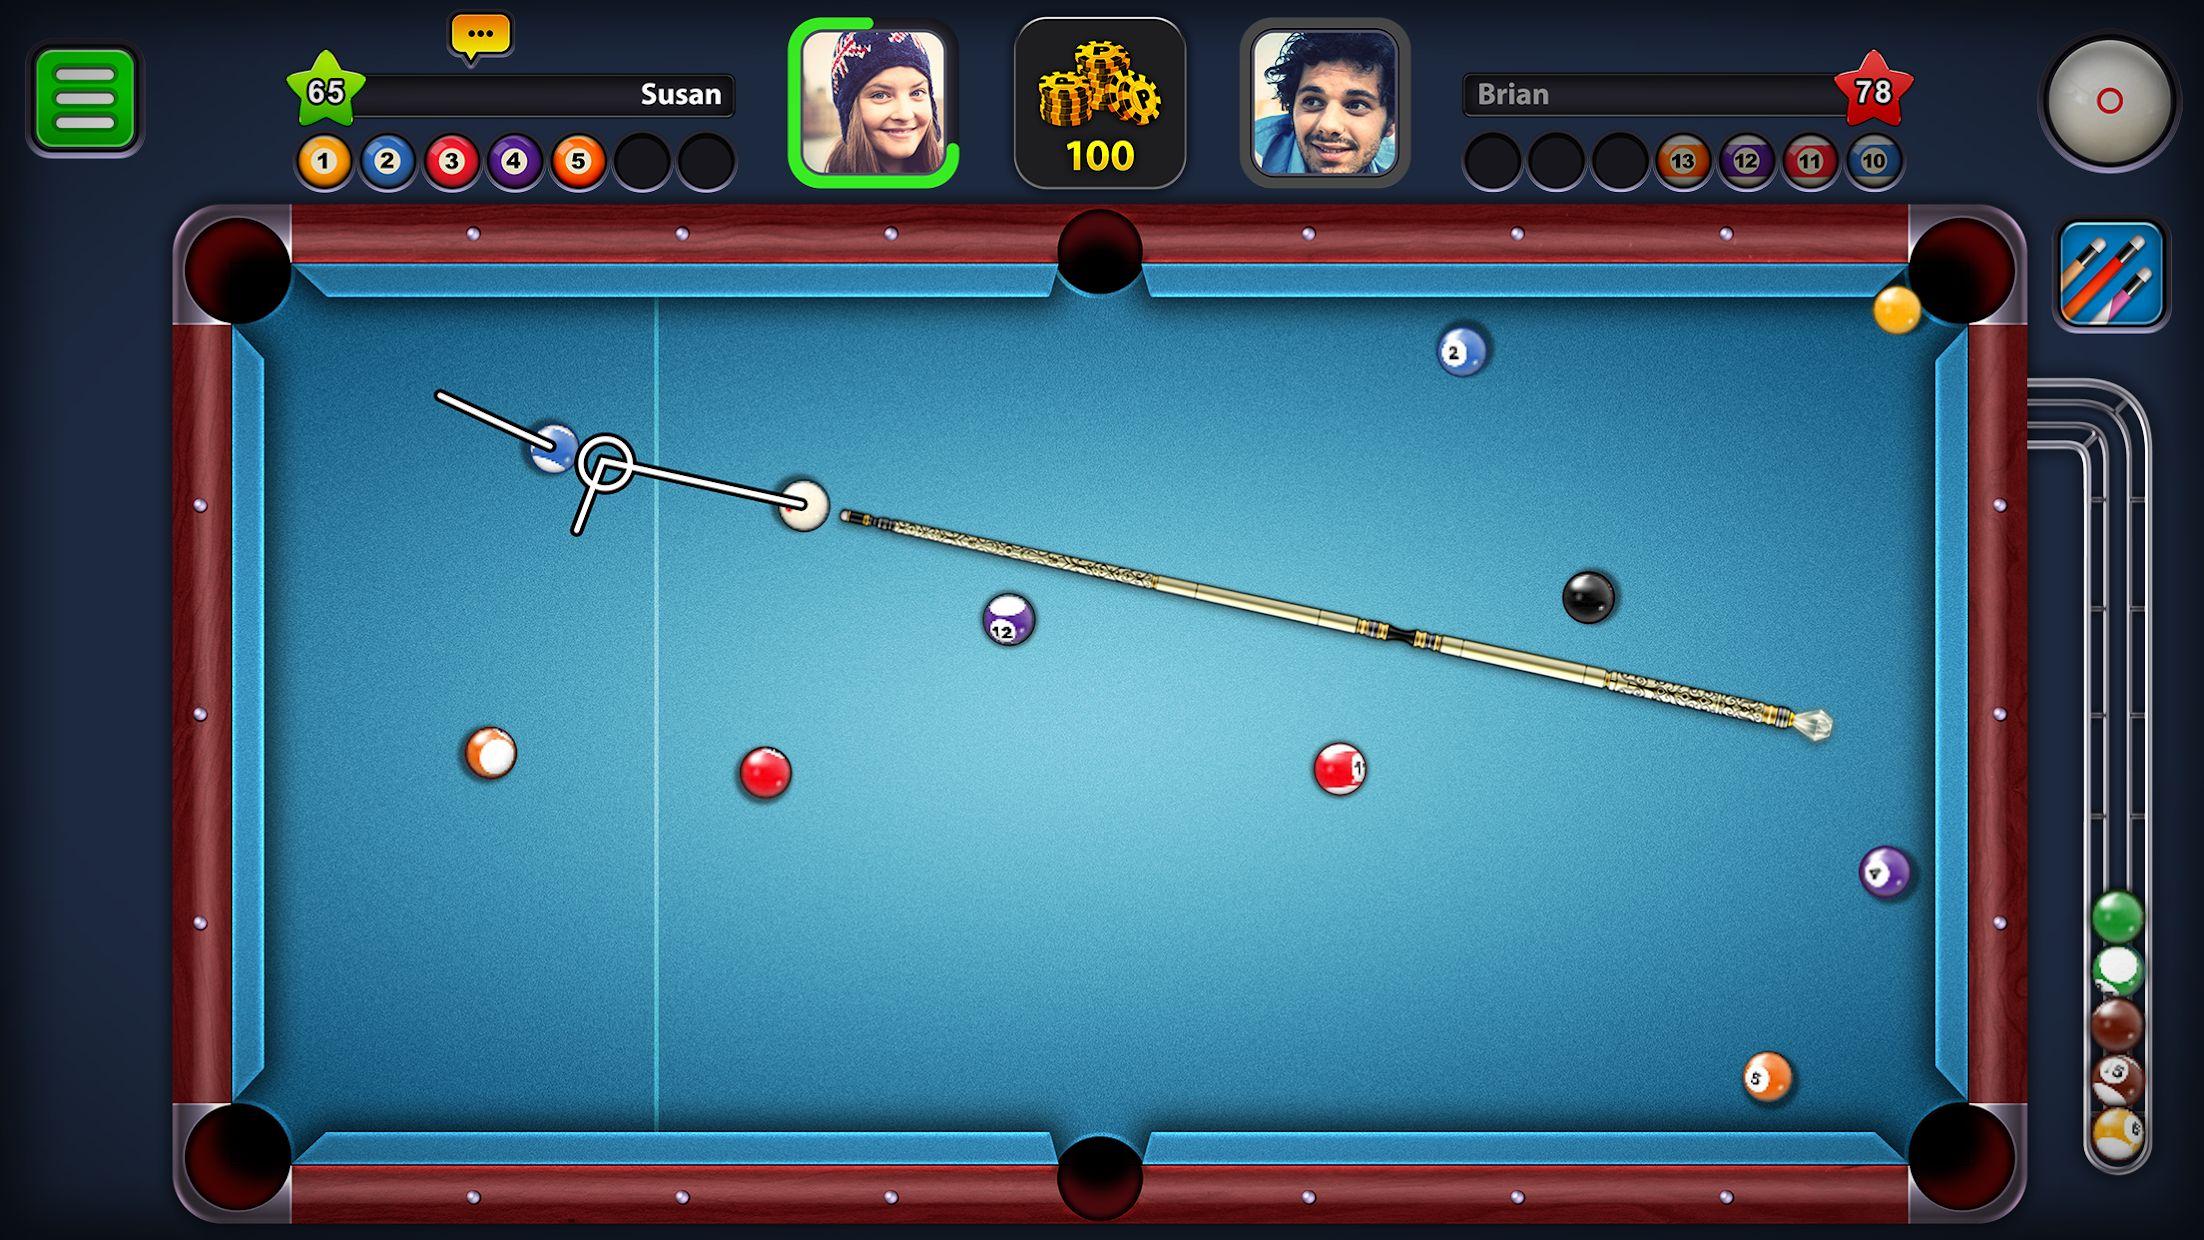 8 Ball Pool 游戏截图1